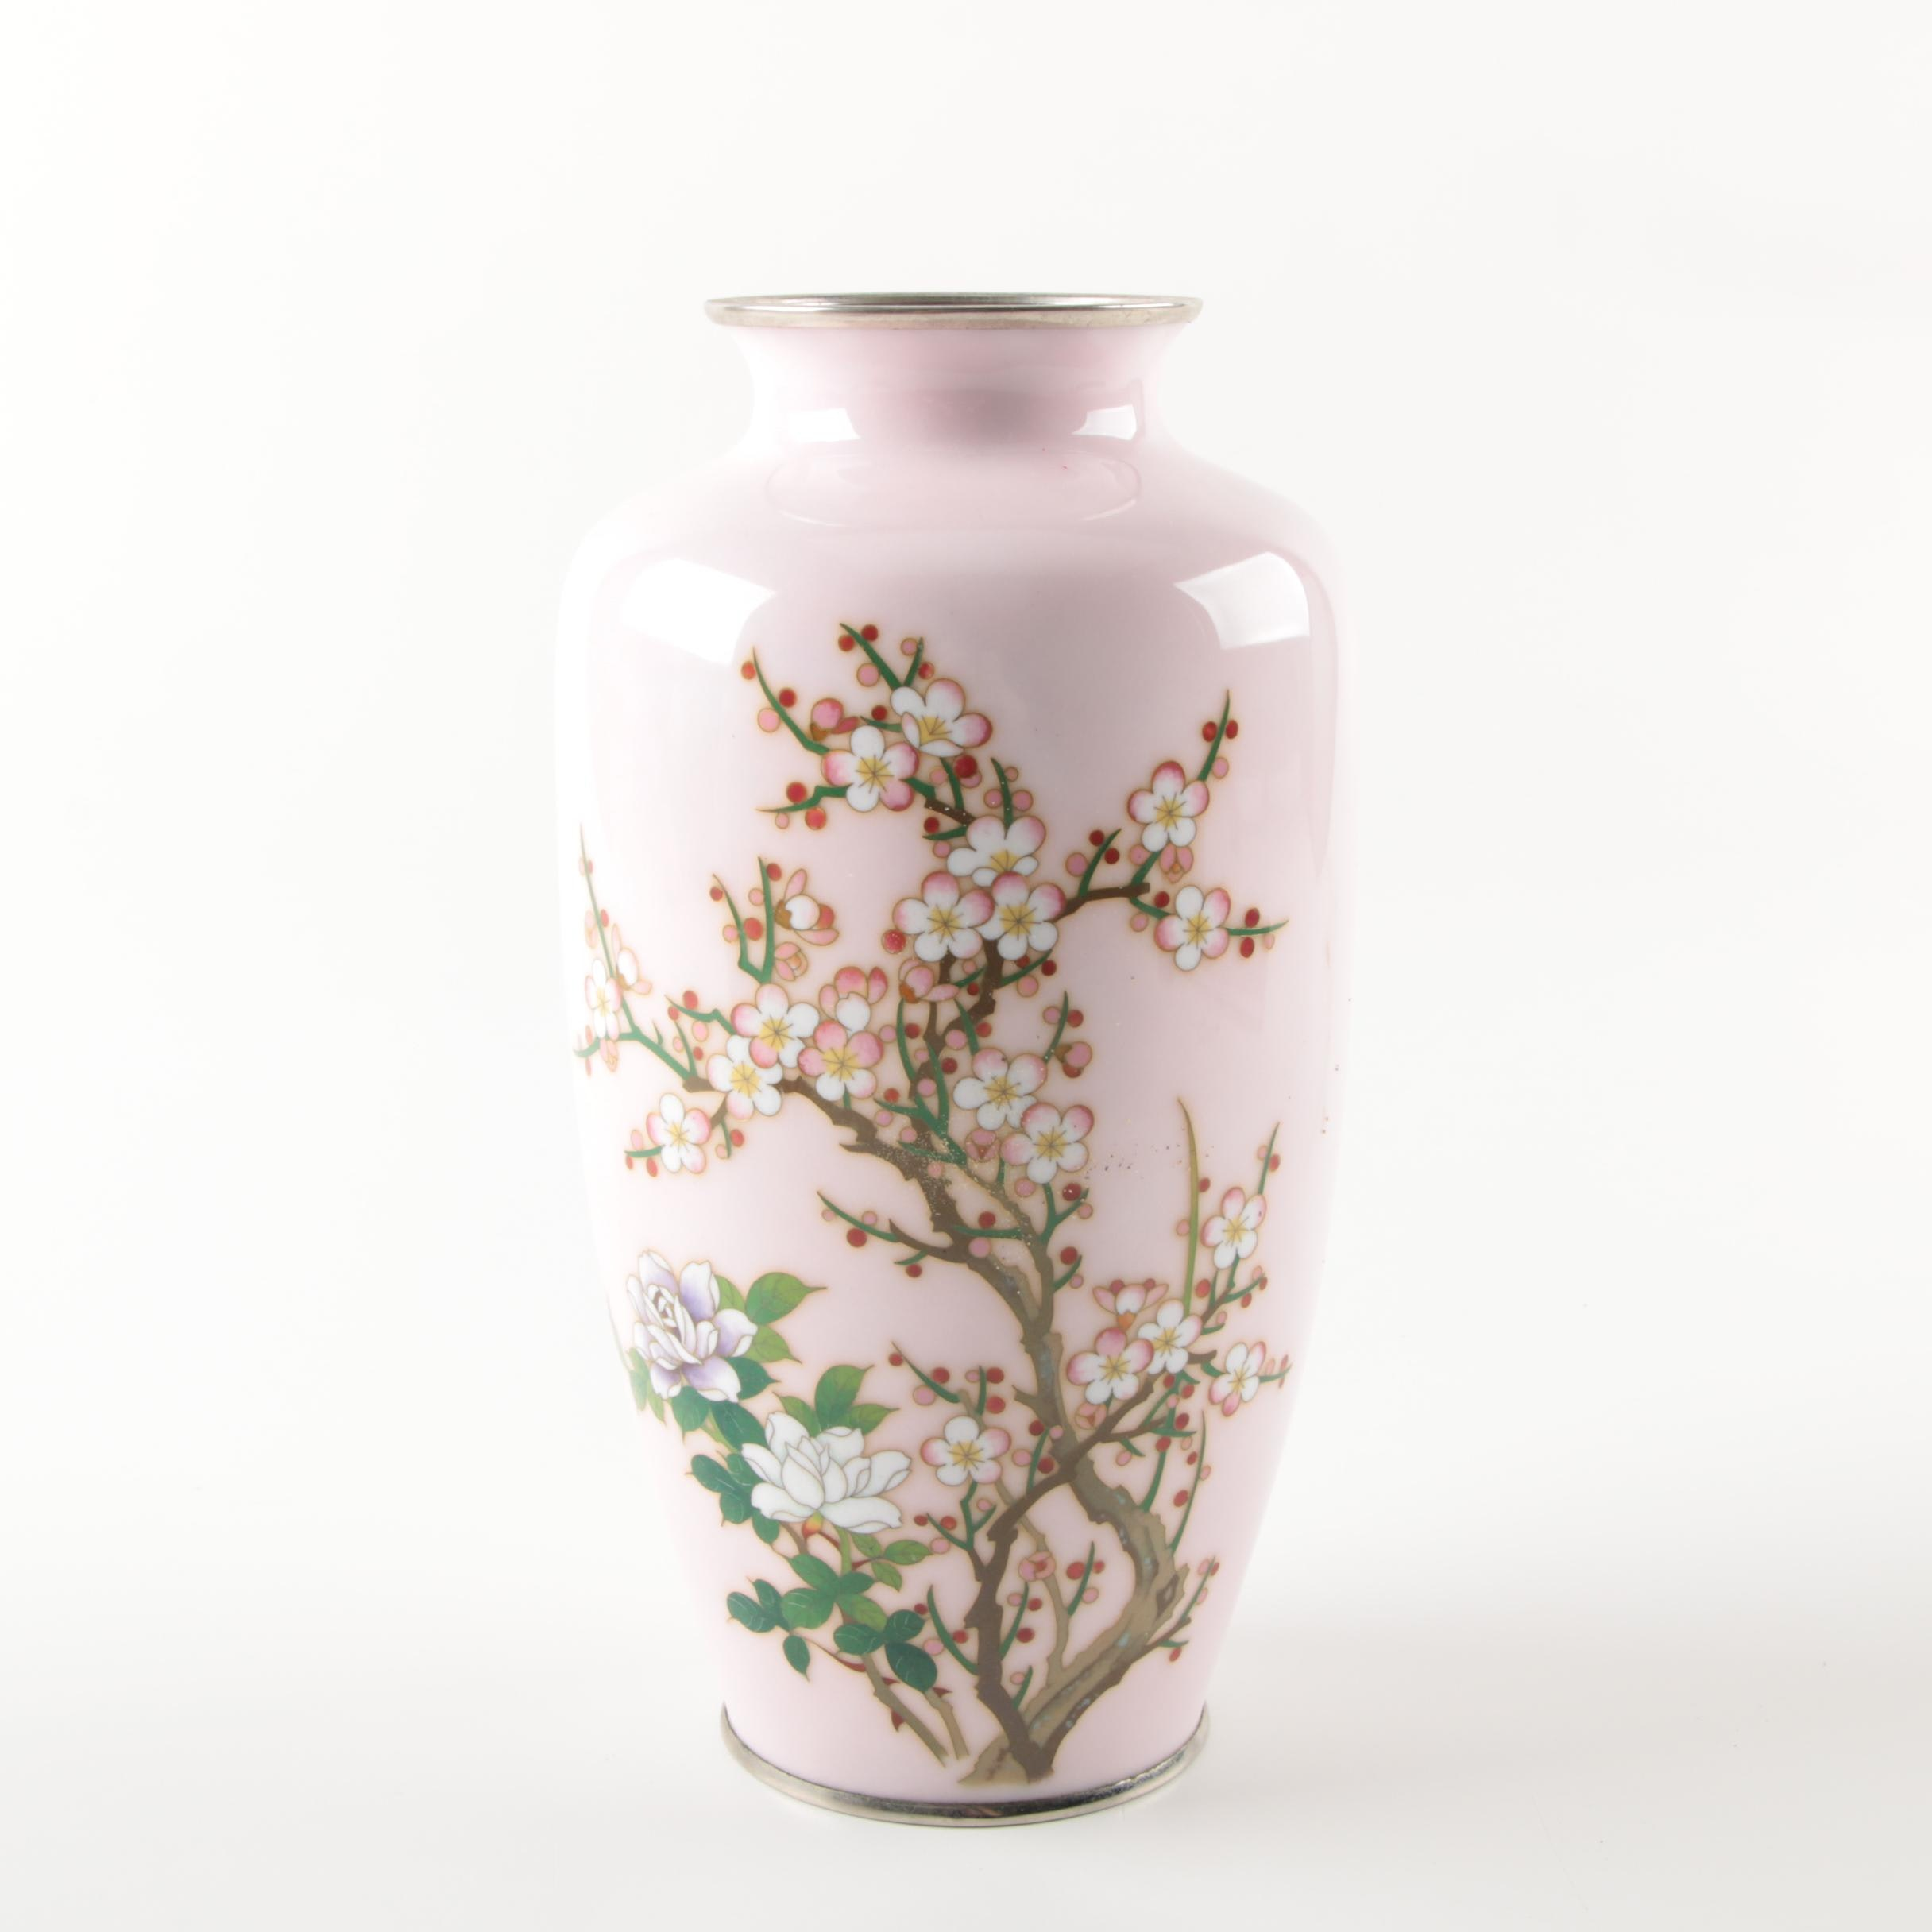 Japanese Sato Cloisonne Vase